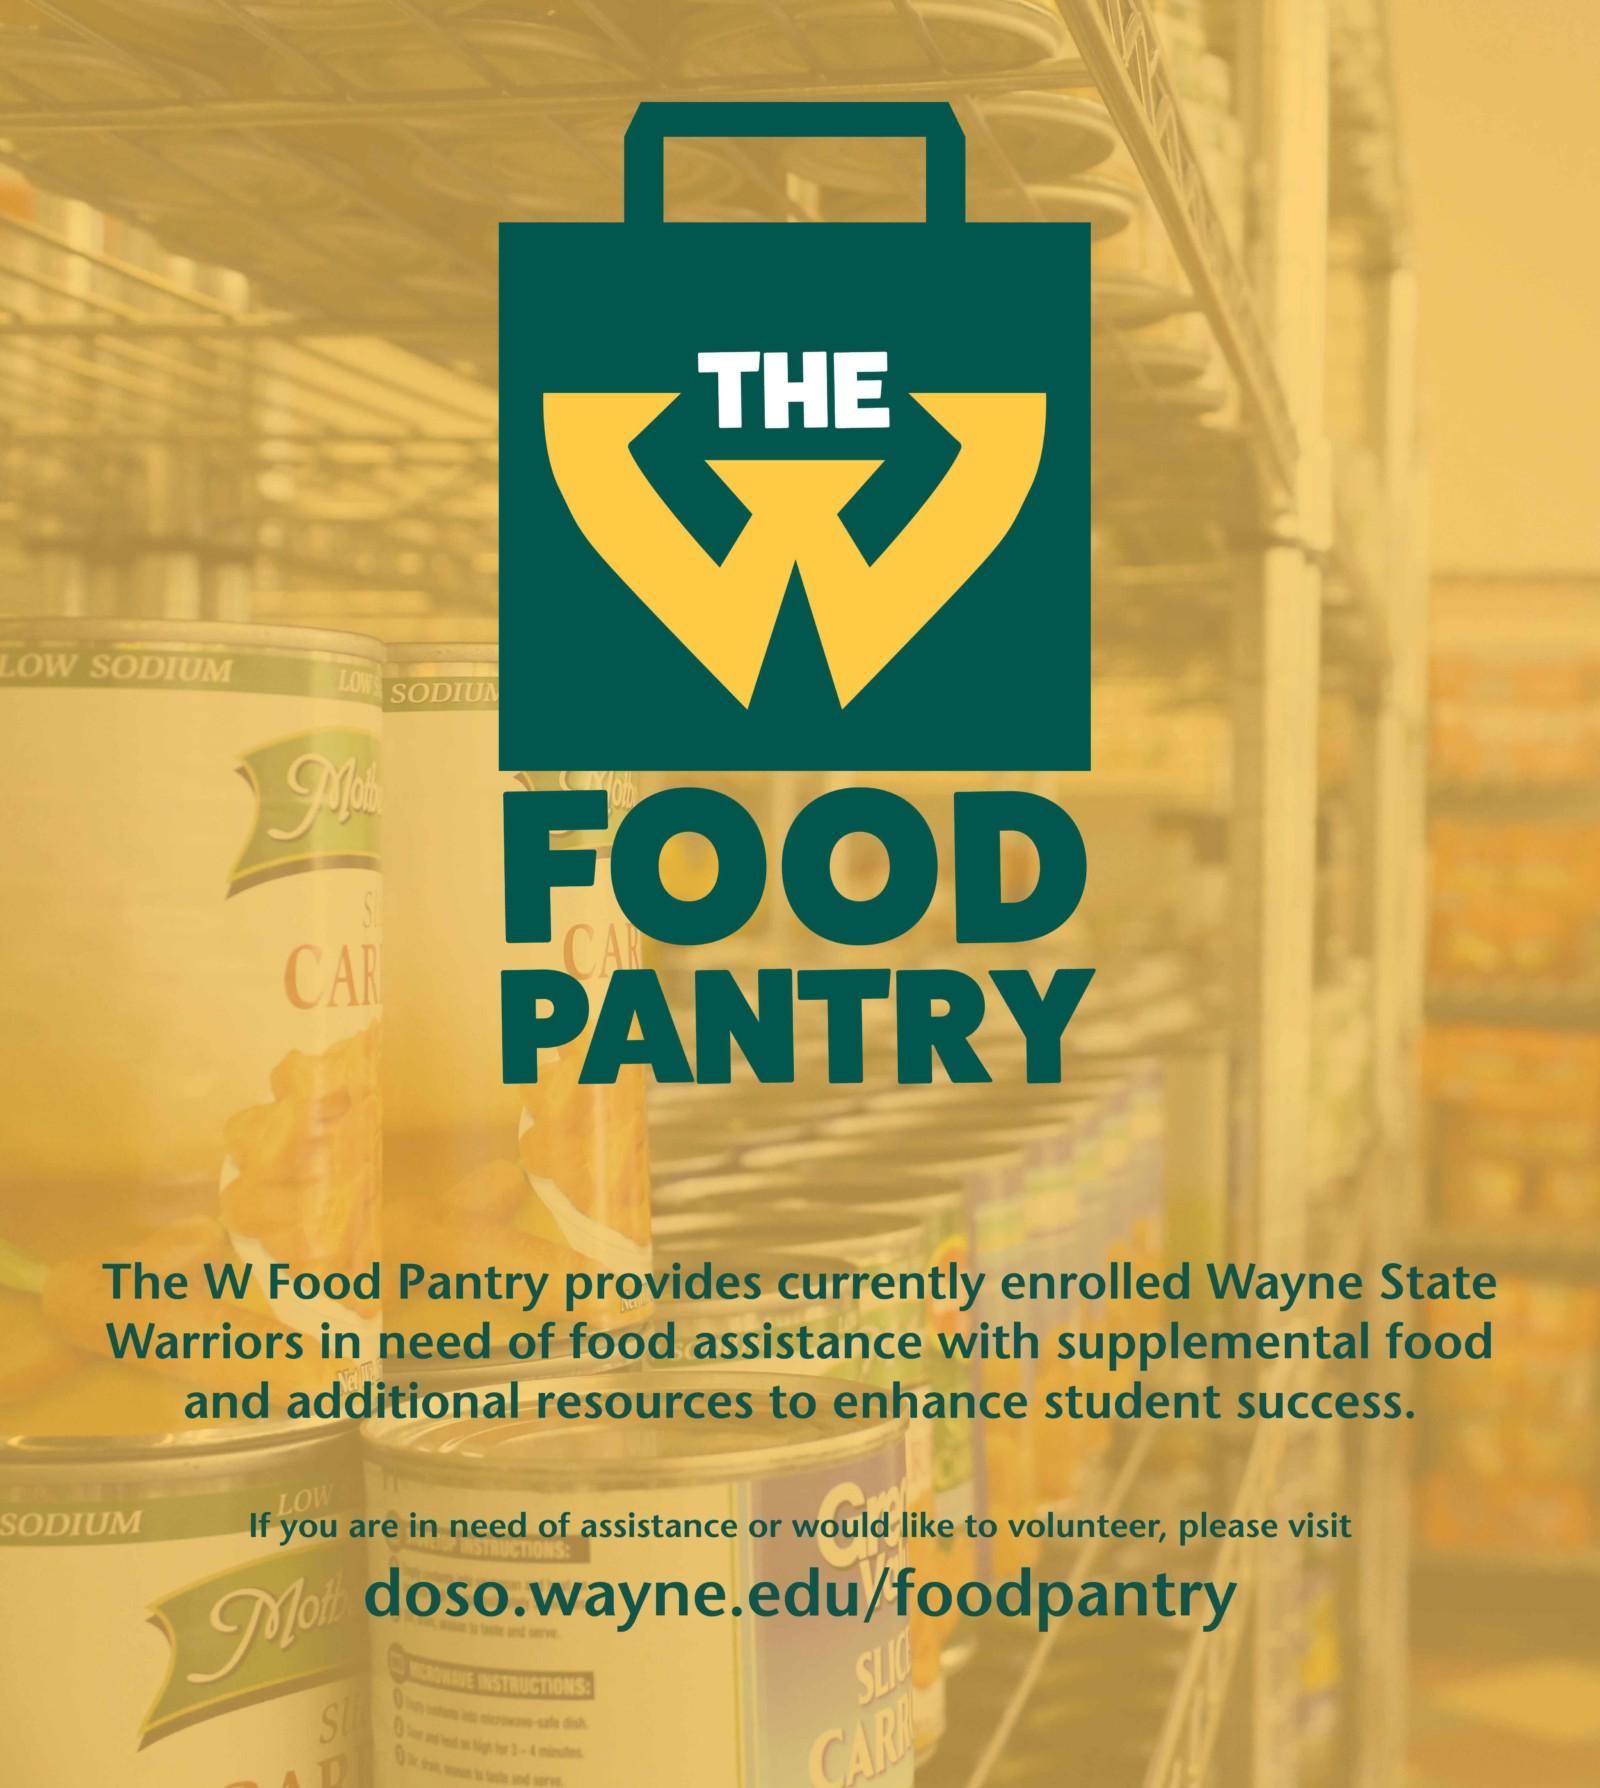 The wayne state university food pantry